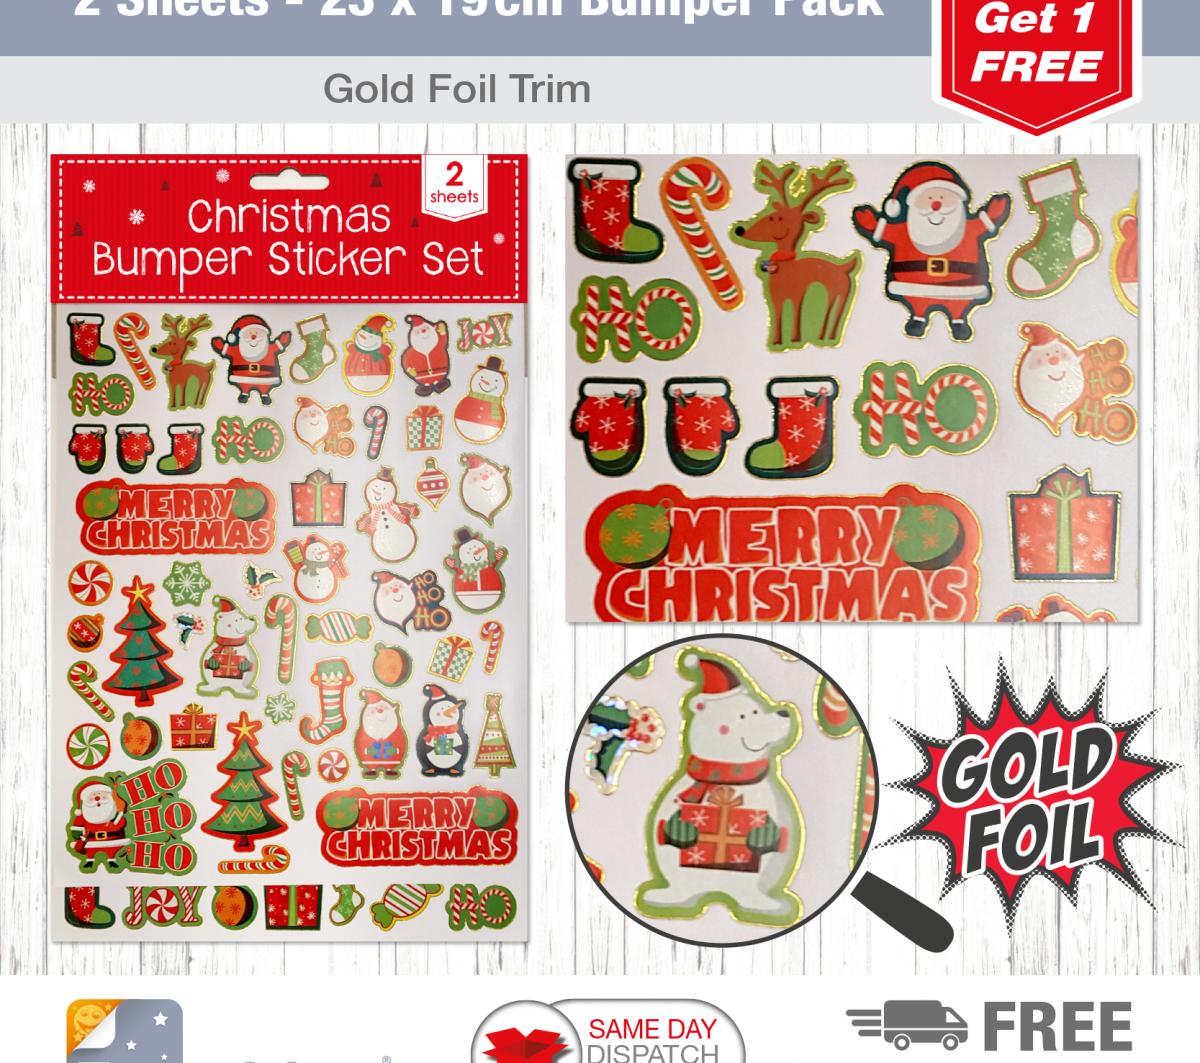 2 Sheet Bumper Pack Christmas Candy-1